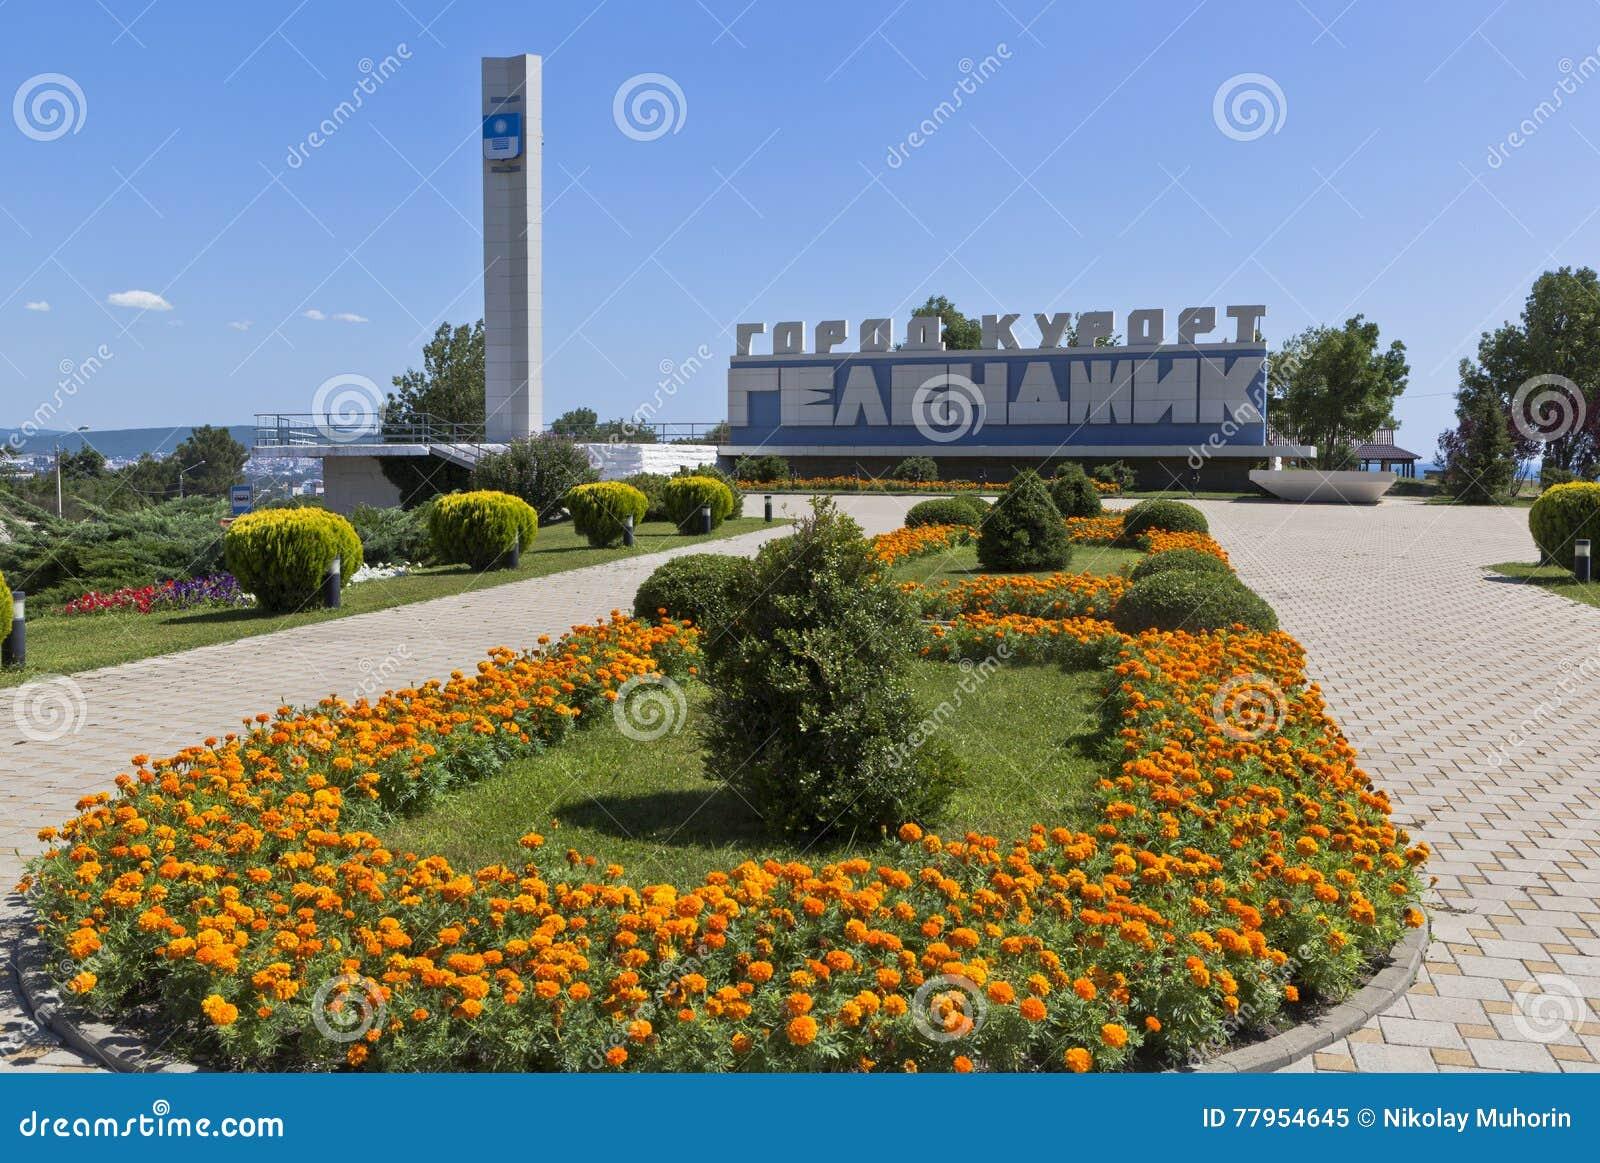 Stela на входе к городу Gelendzhik, зоне Краснодара